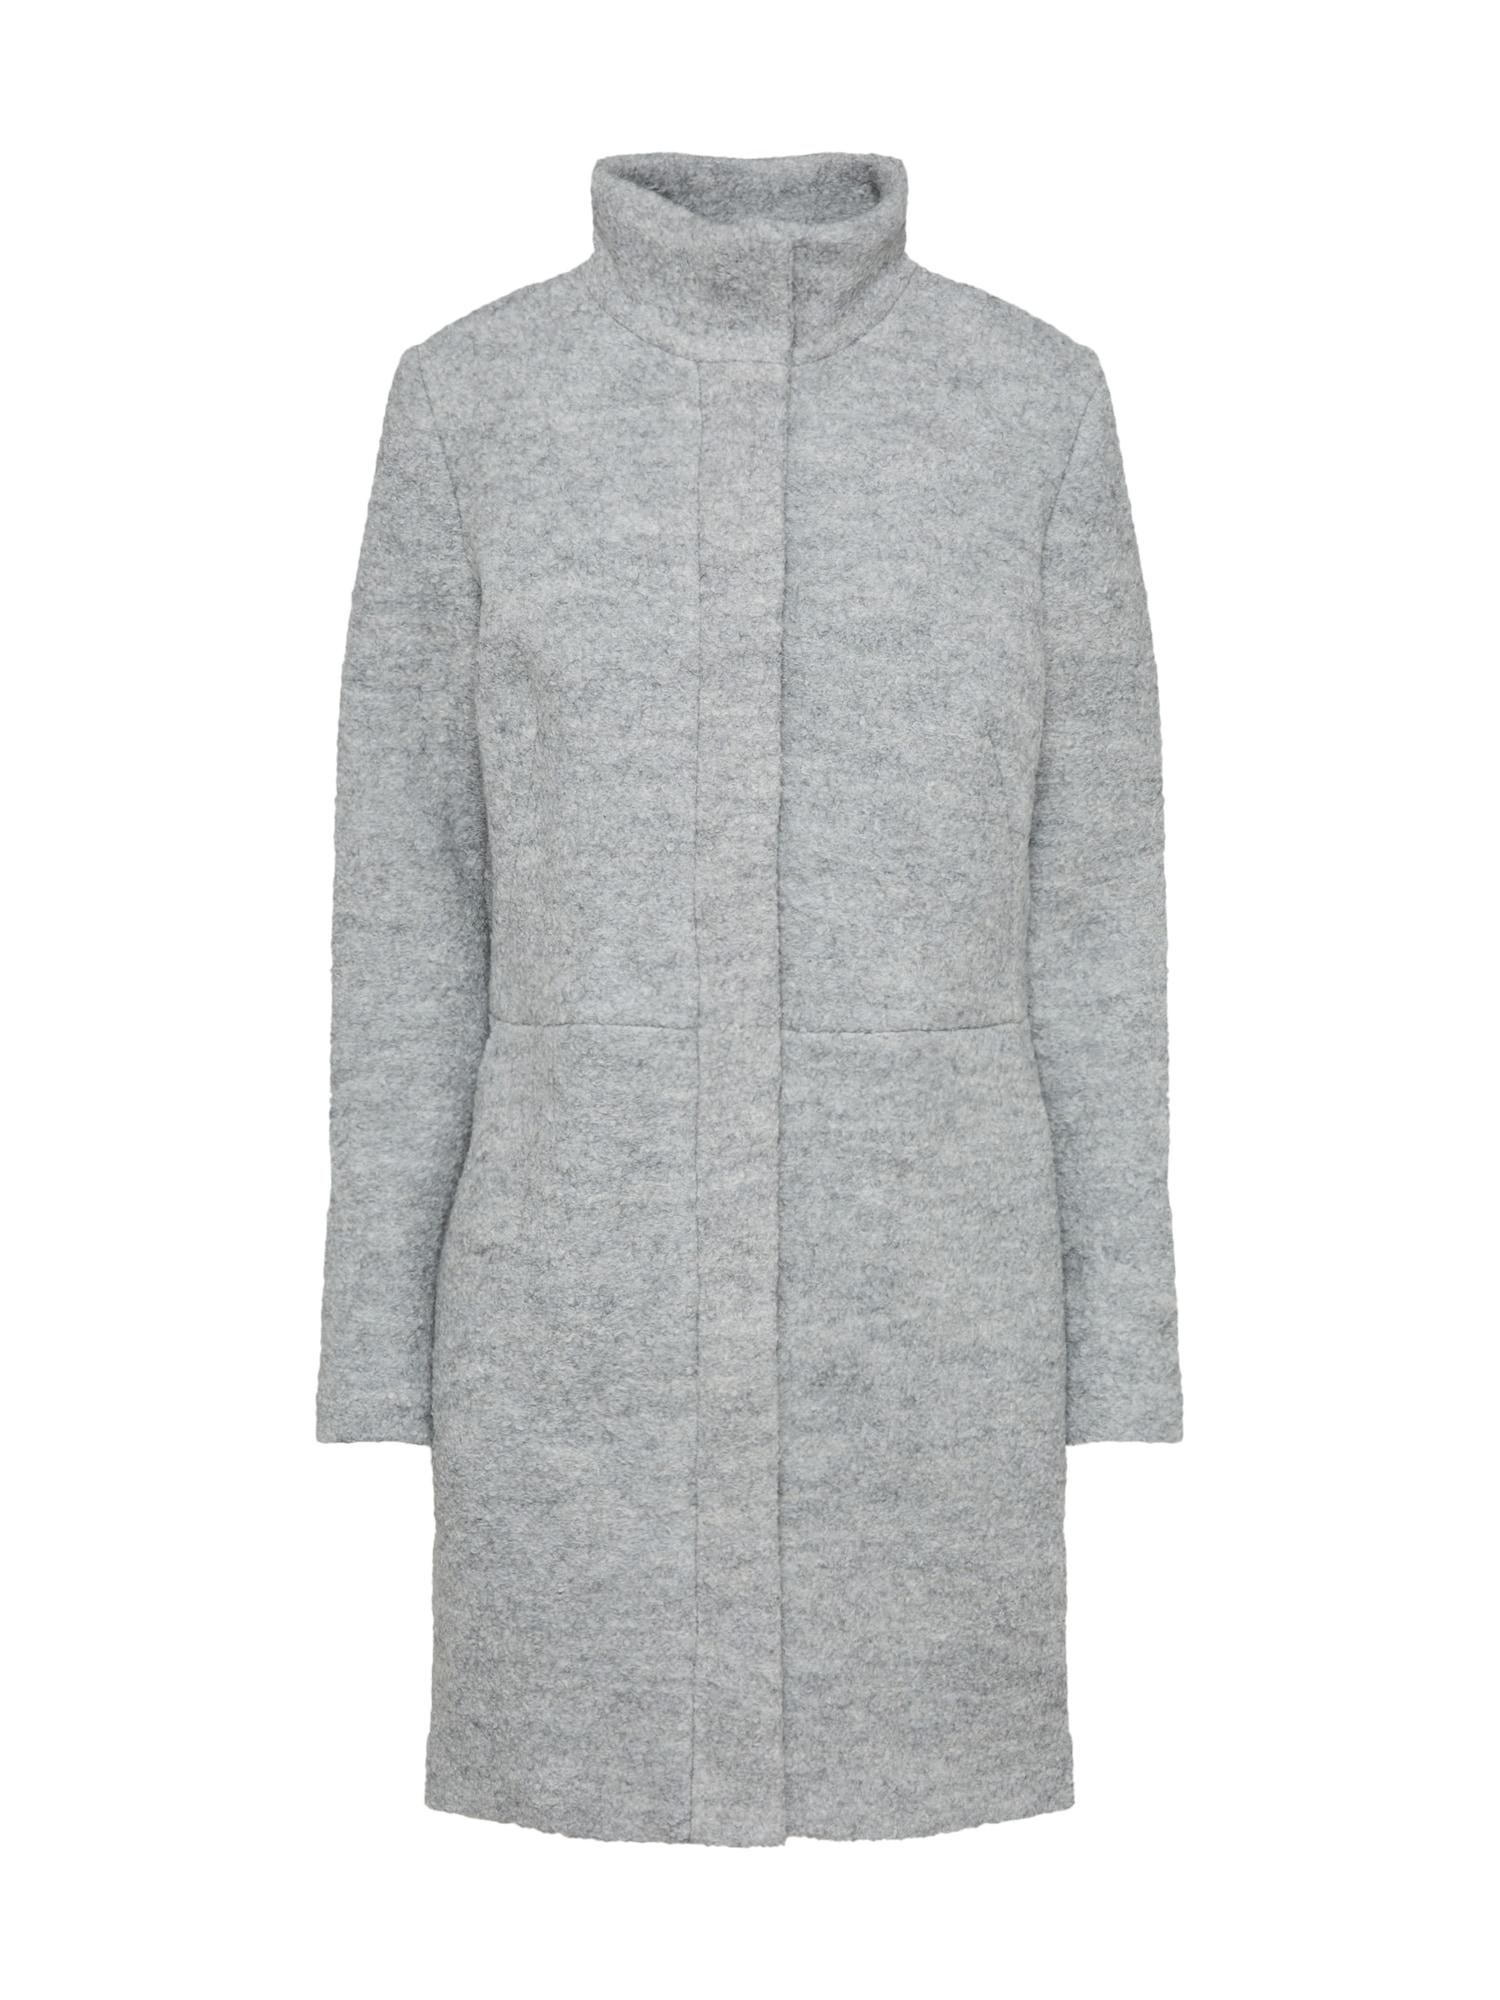 Zimní kabát Vialanis šedý melír VILA